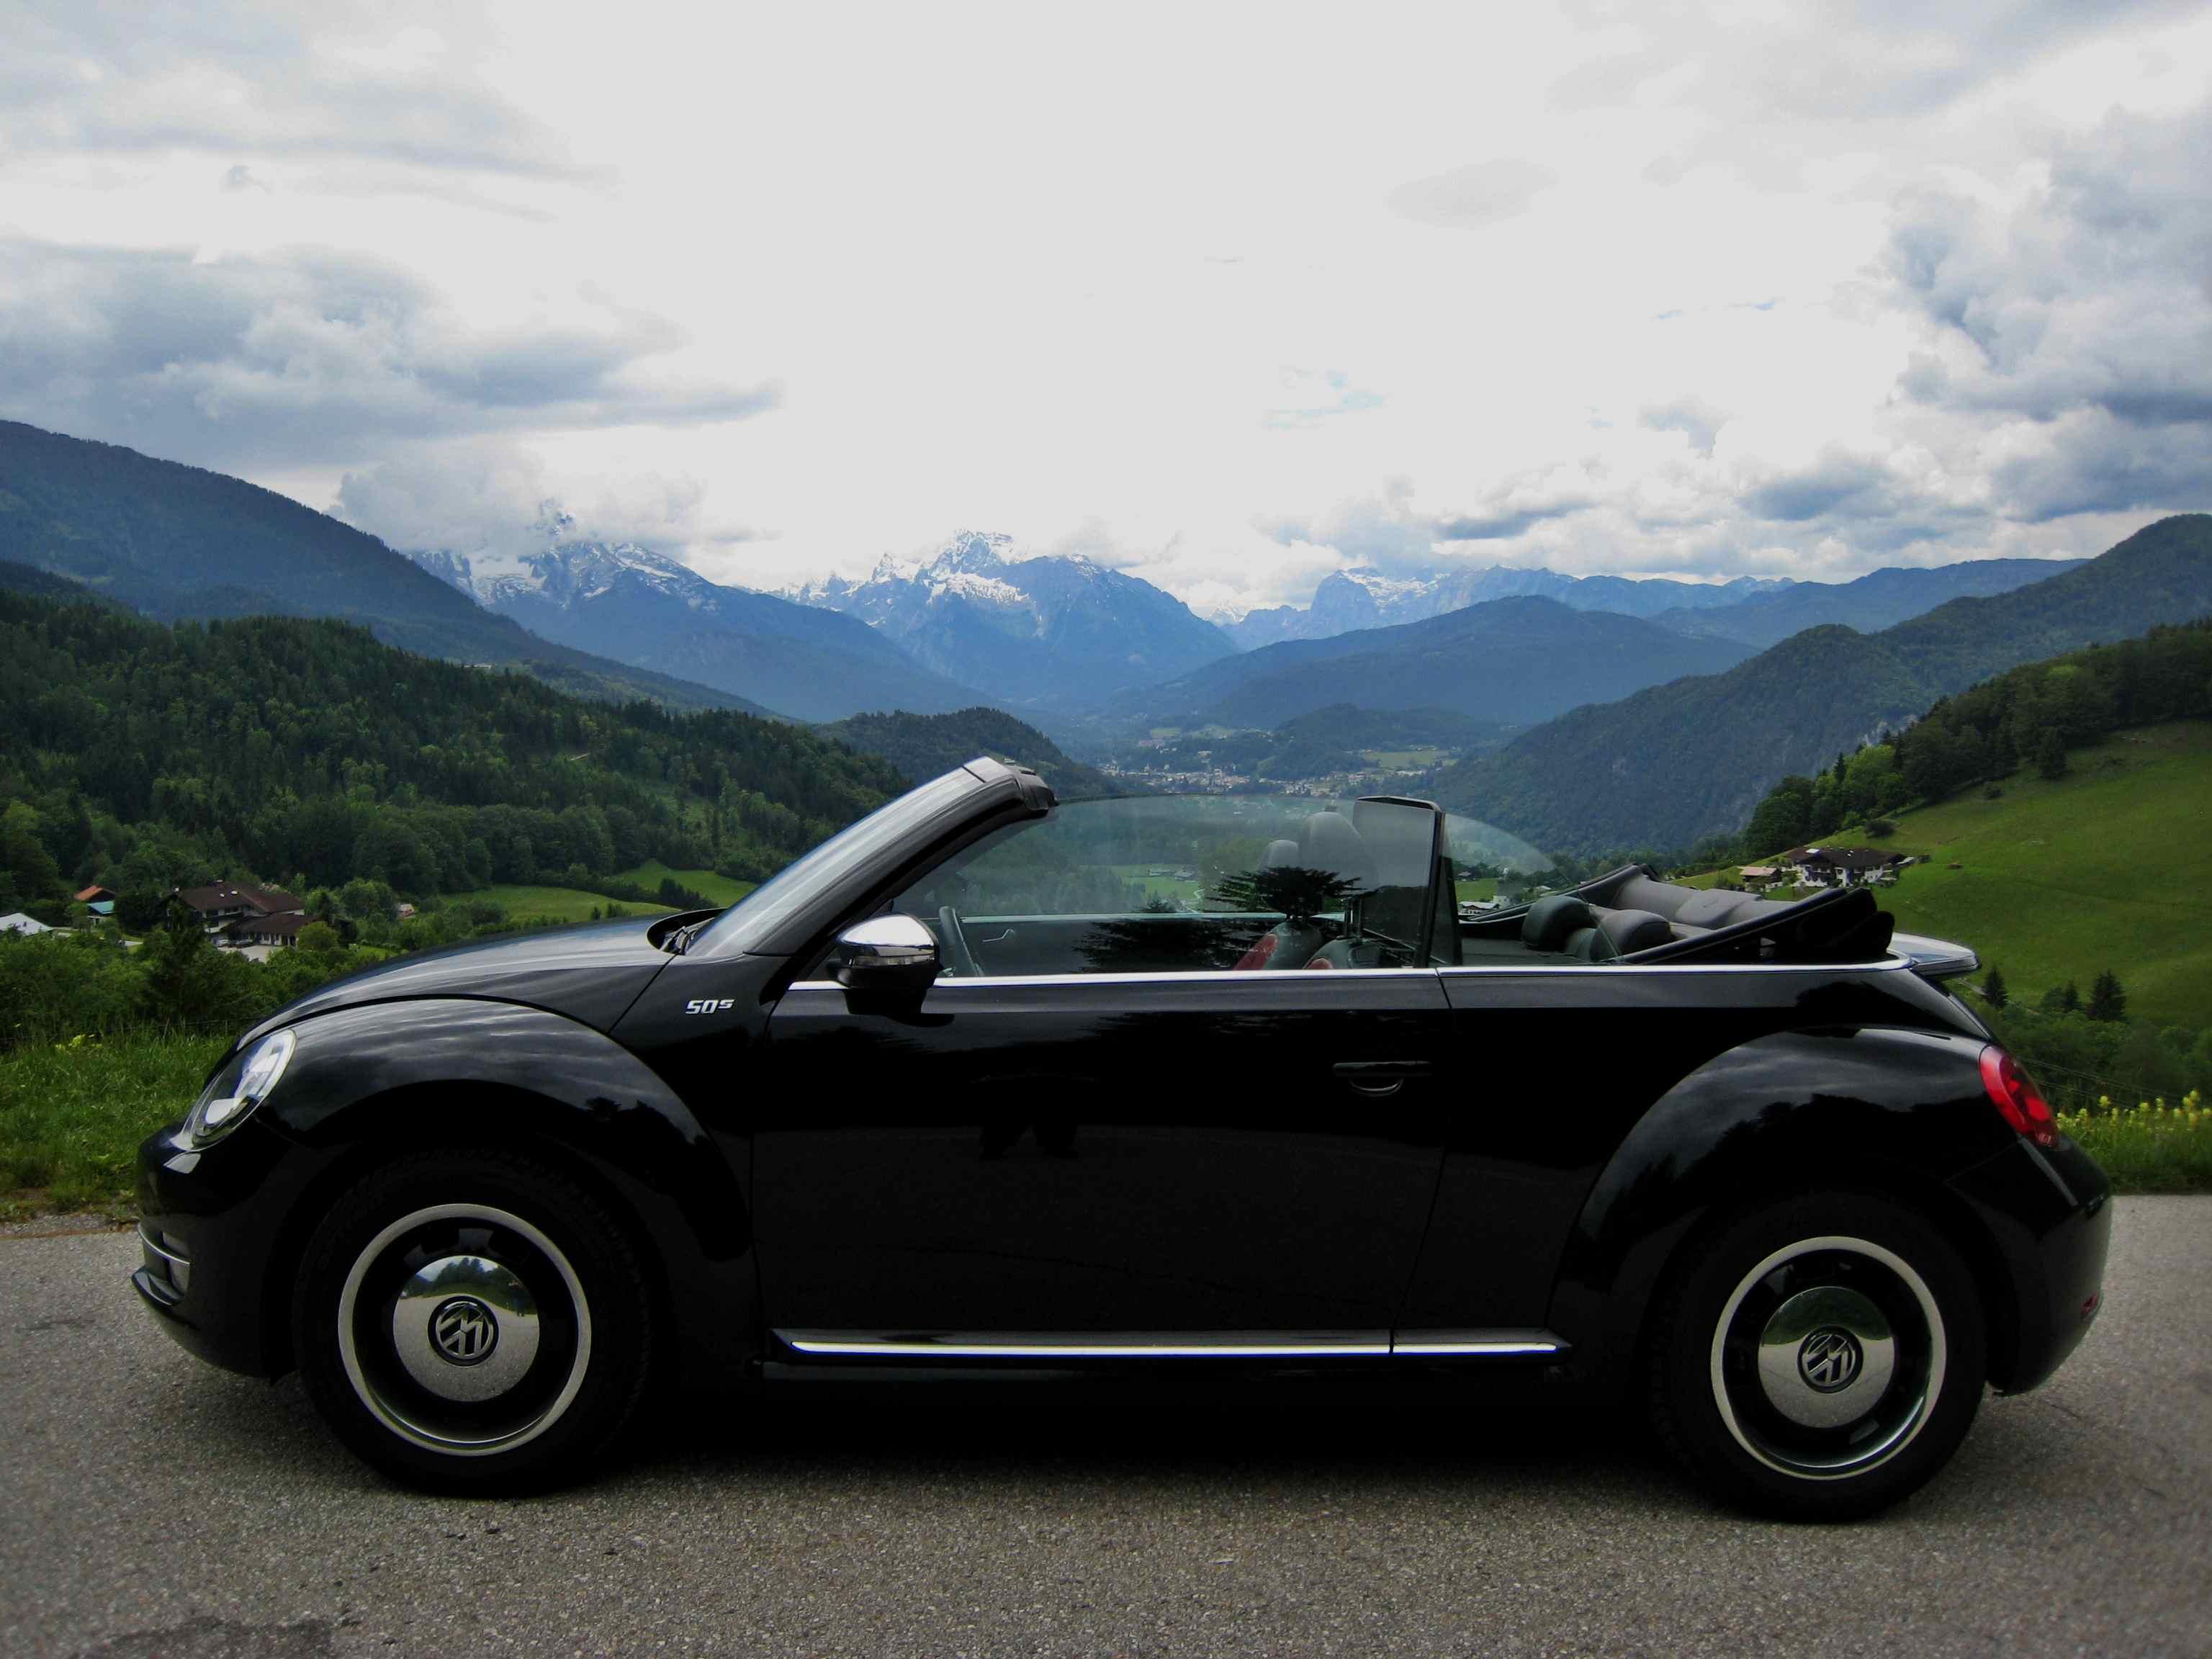 berchtesgadener land archives vielweib on tour. Black Bedroom Furniture Sets. Home Design Ideas